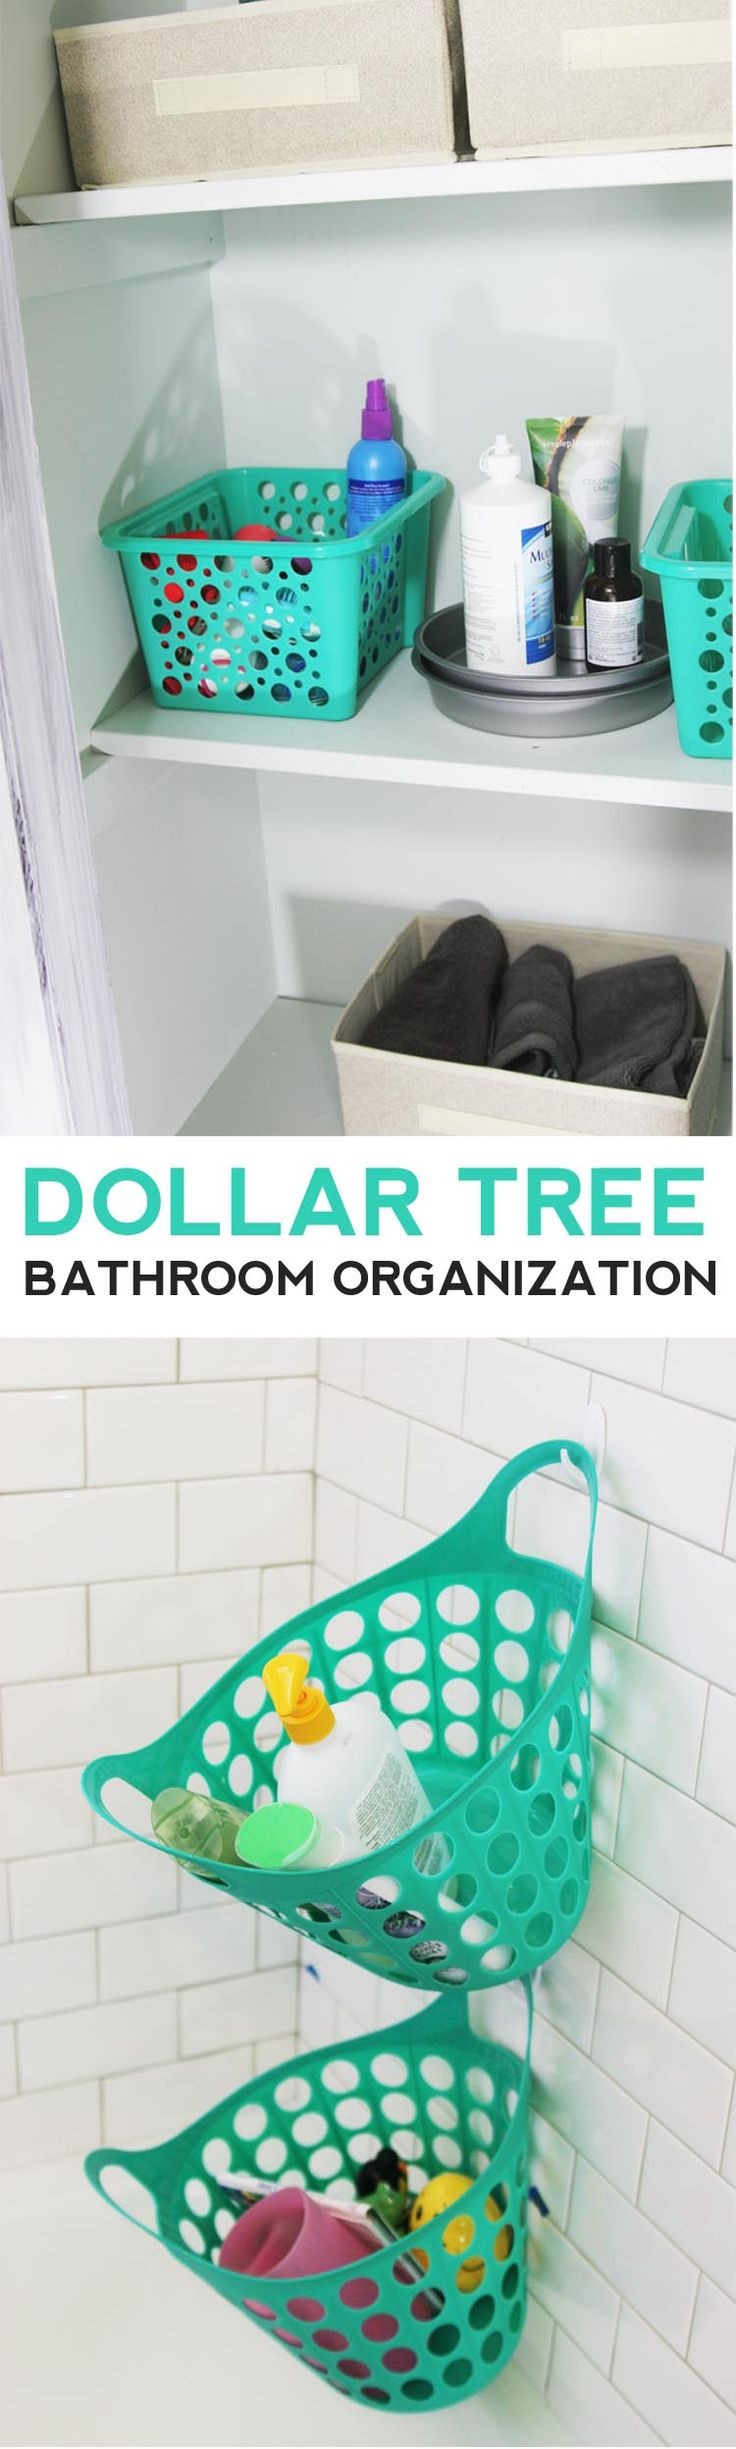 19 best Bathroom Storage and Organization images on Pinterest ...